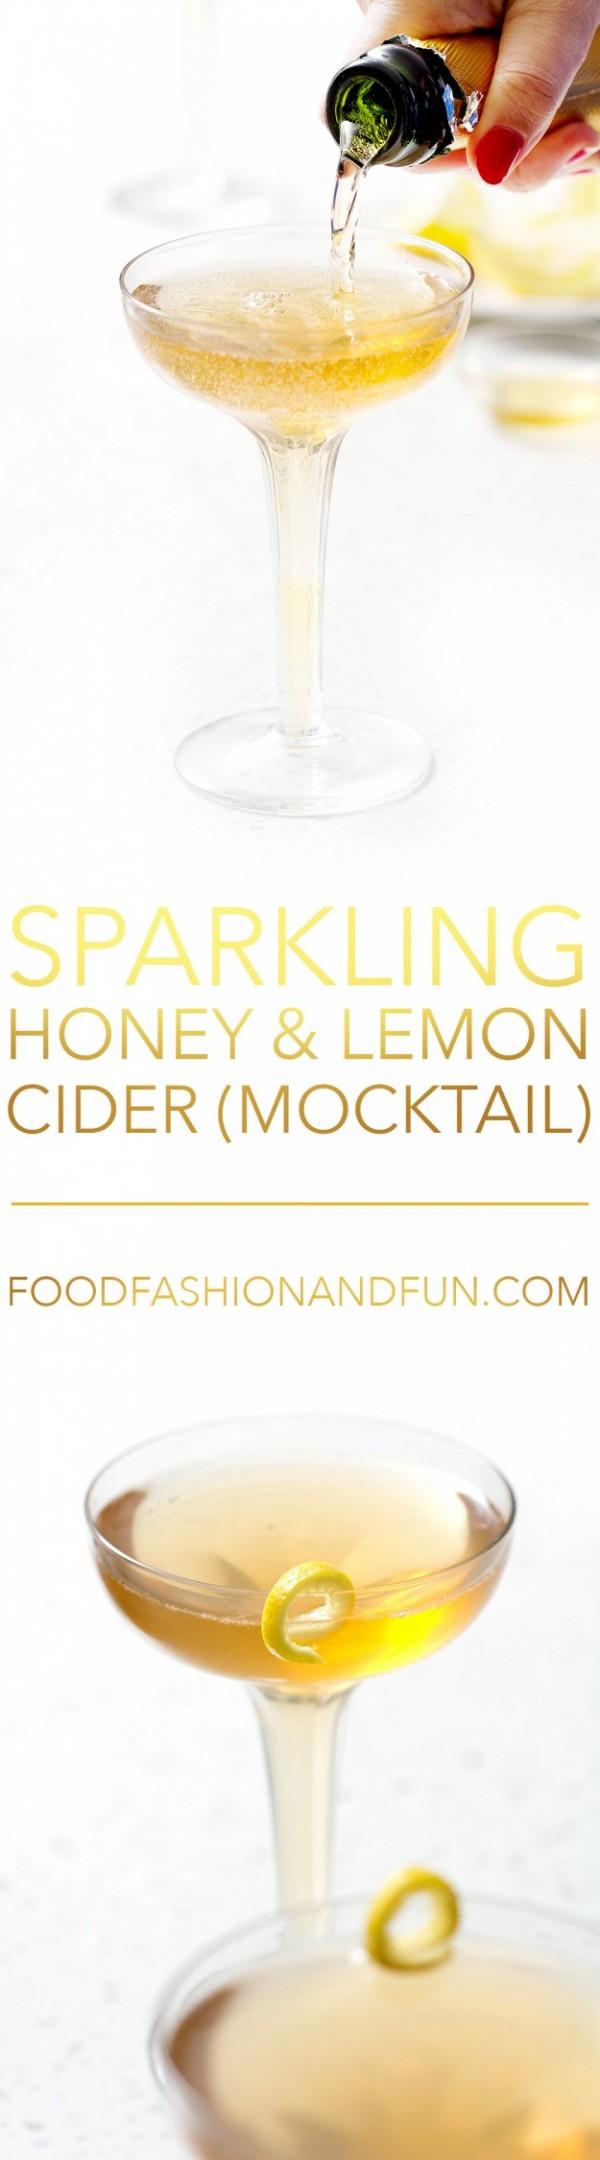 Sparkling Lemon and Honey Cider (mocktail) \ Food Fashion and Fun